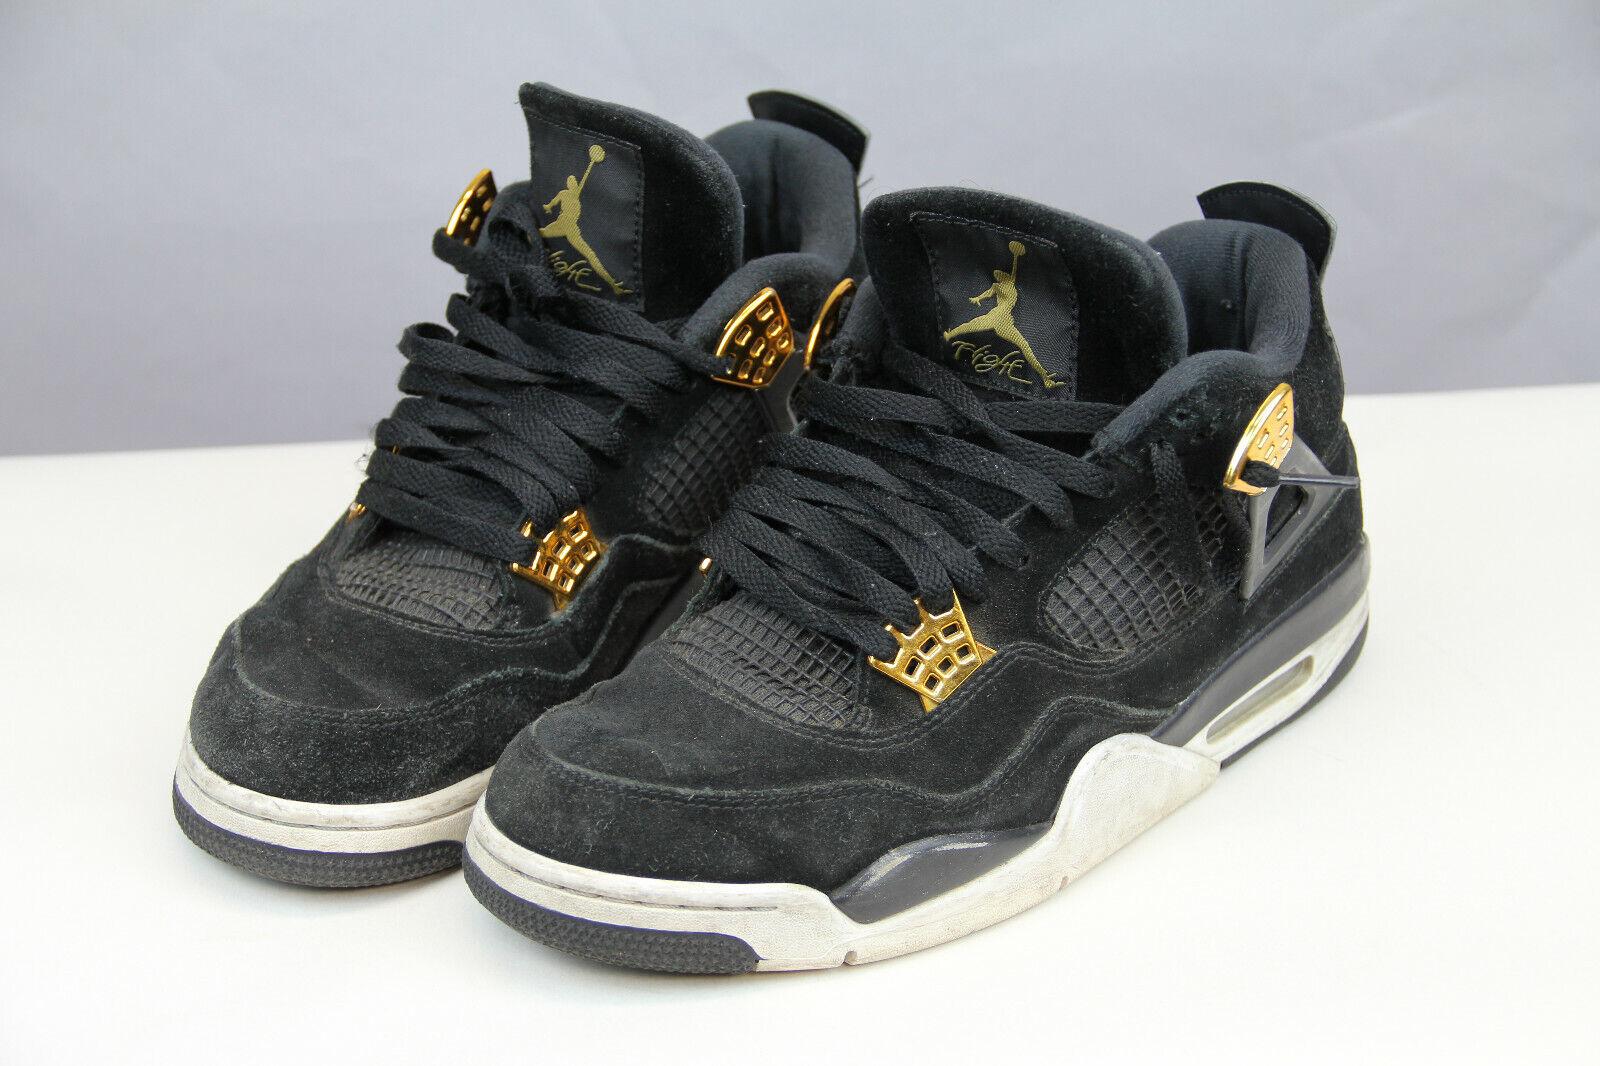 bf0795164946c4 Nike Air Jordan IV Retro 4 Premium Royalty Suede Black Gold Aj4 ...